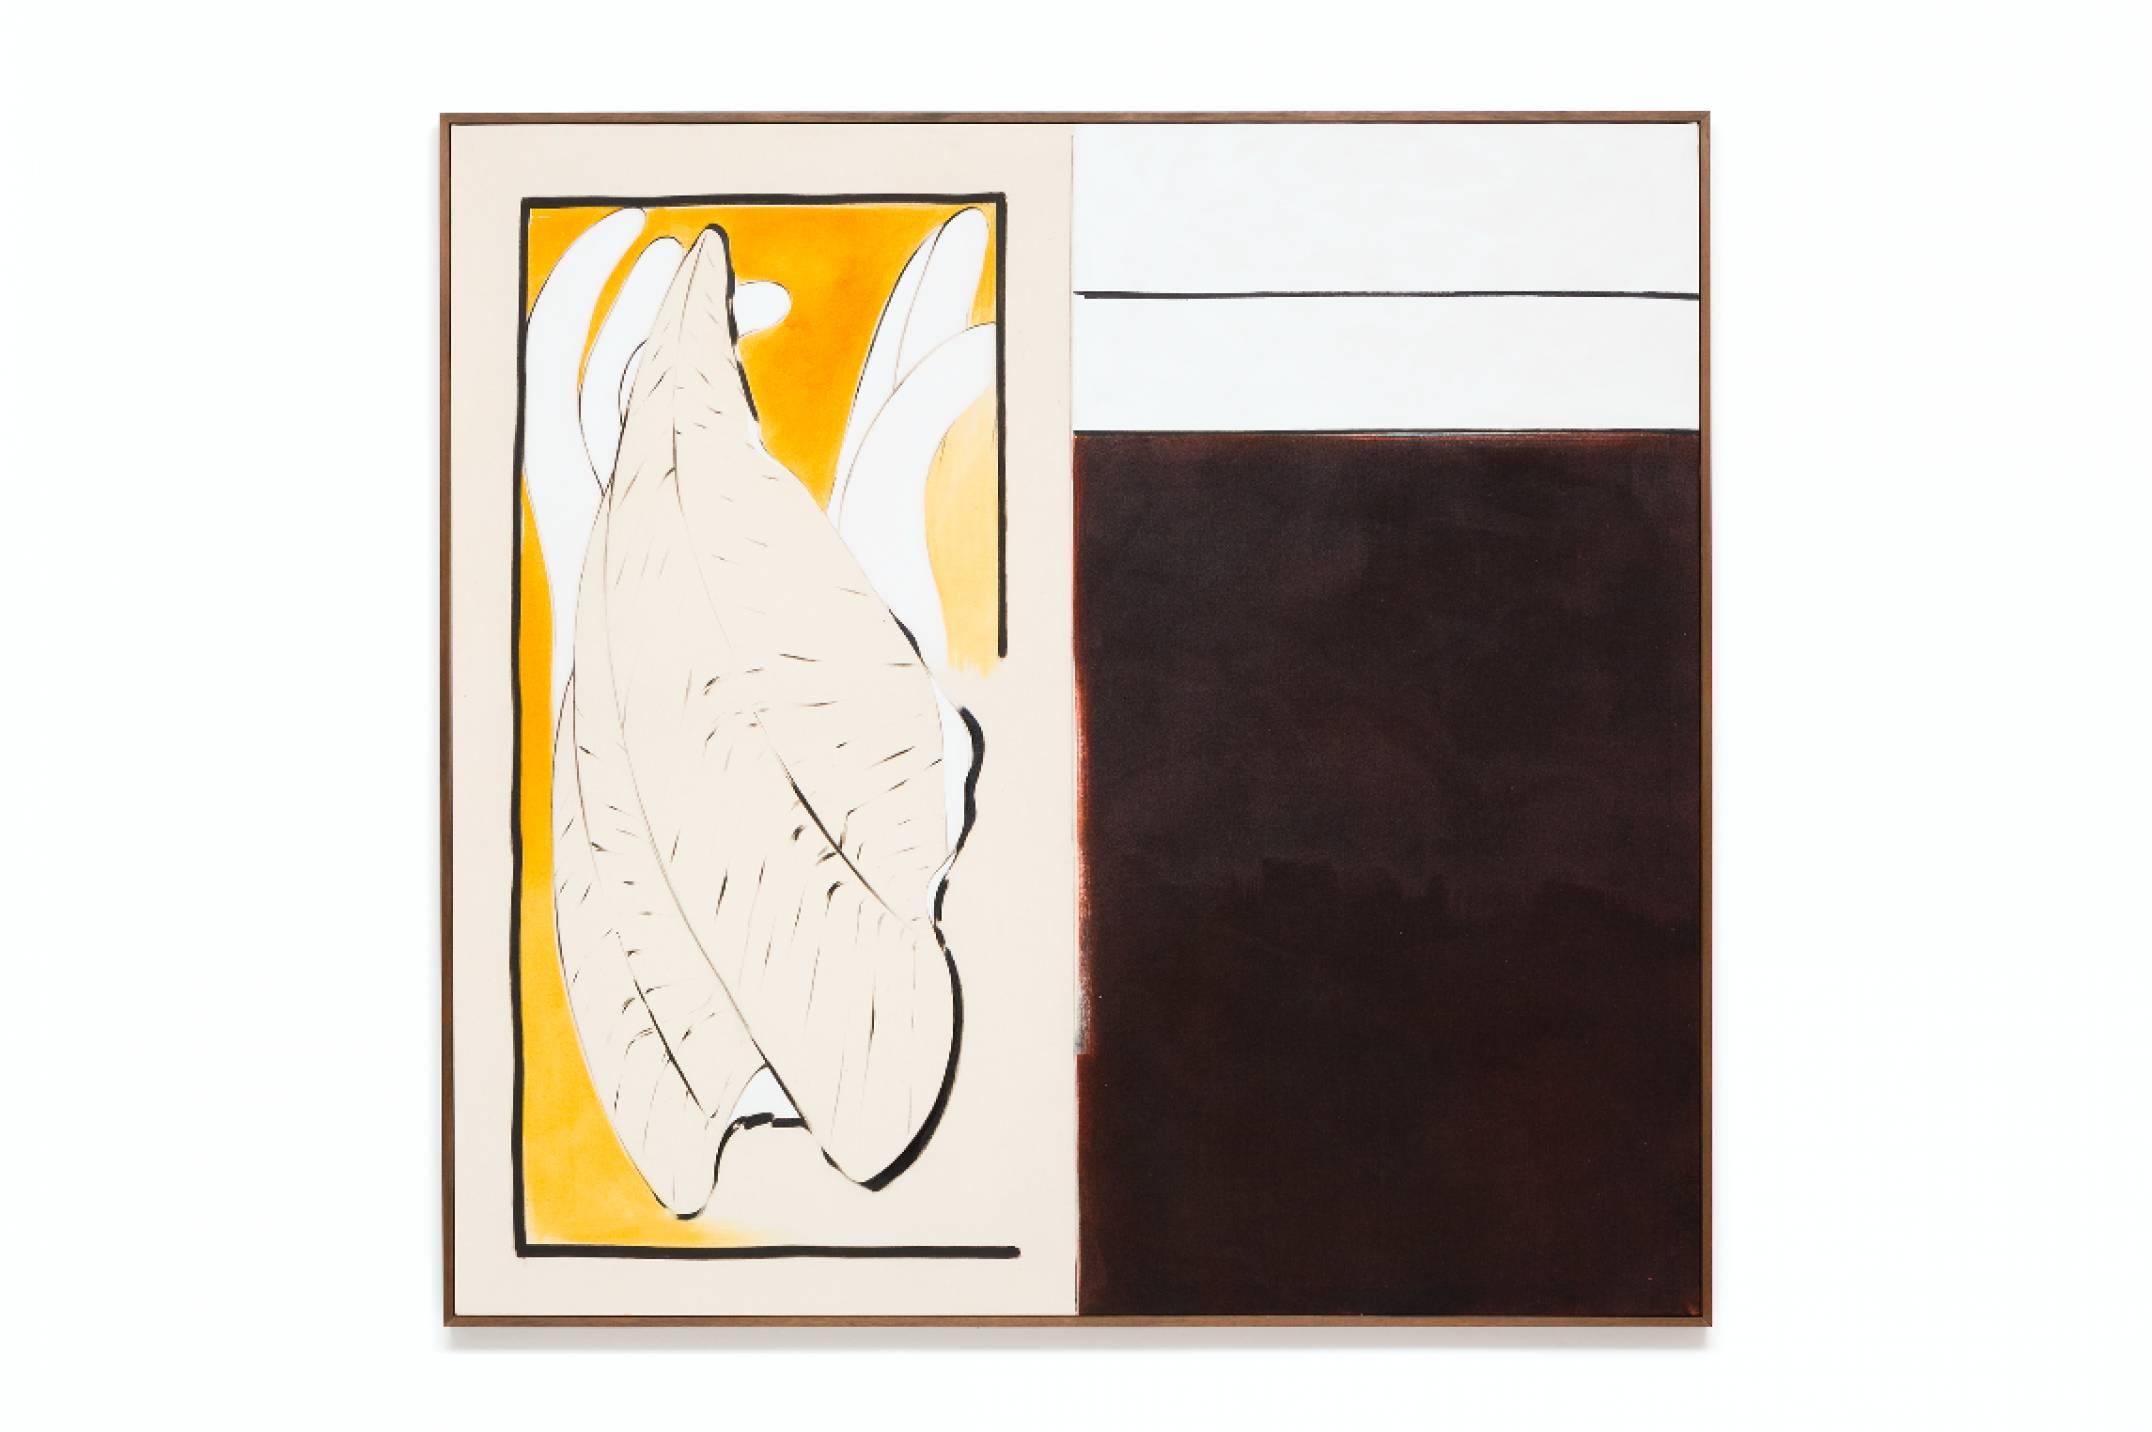 Julie Beaufils, <em>Wild fish</em>, 2017, acrylic and ink on canvas, 130 × 130 cm - Mendes Wood DM